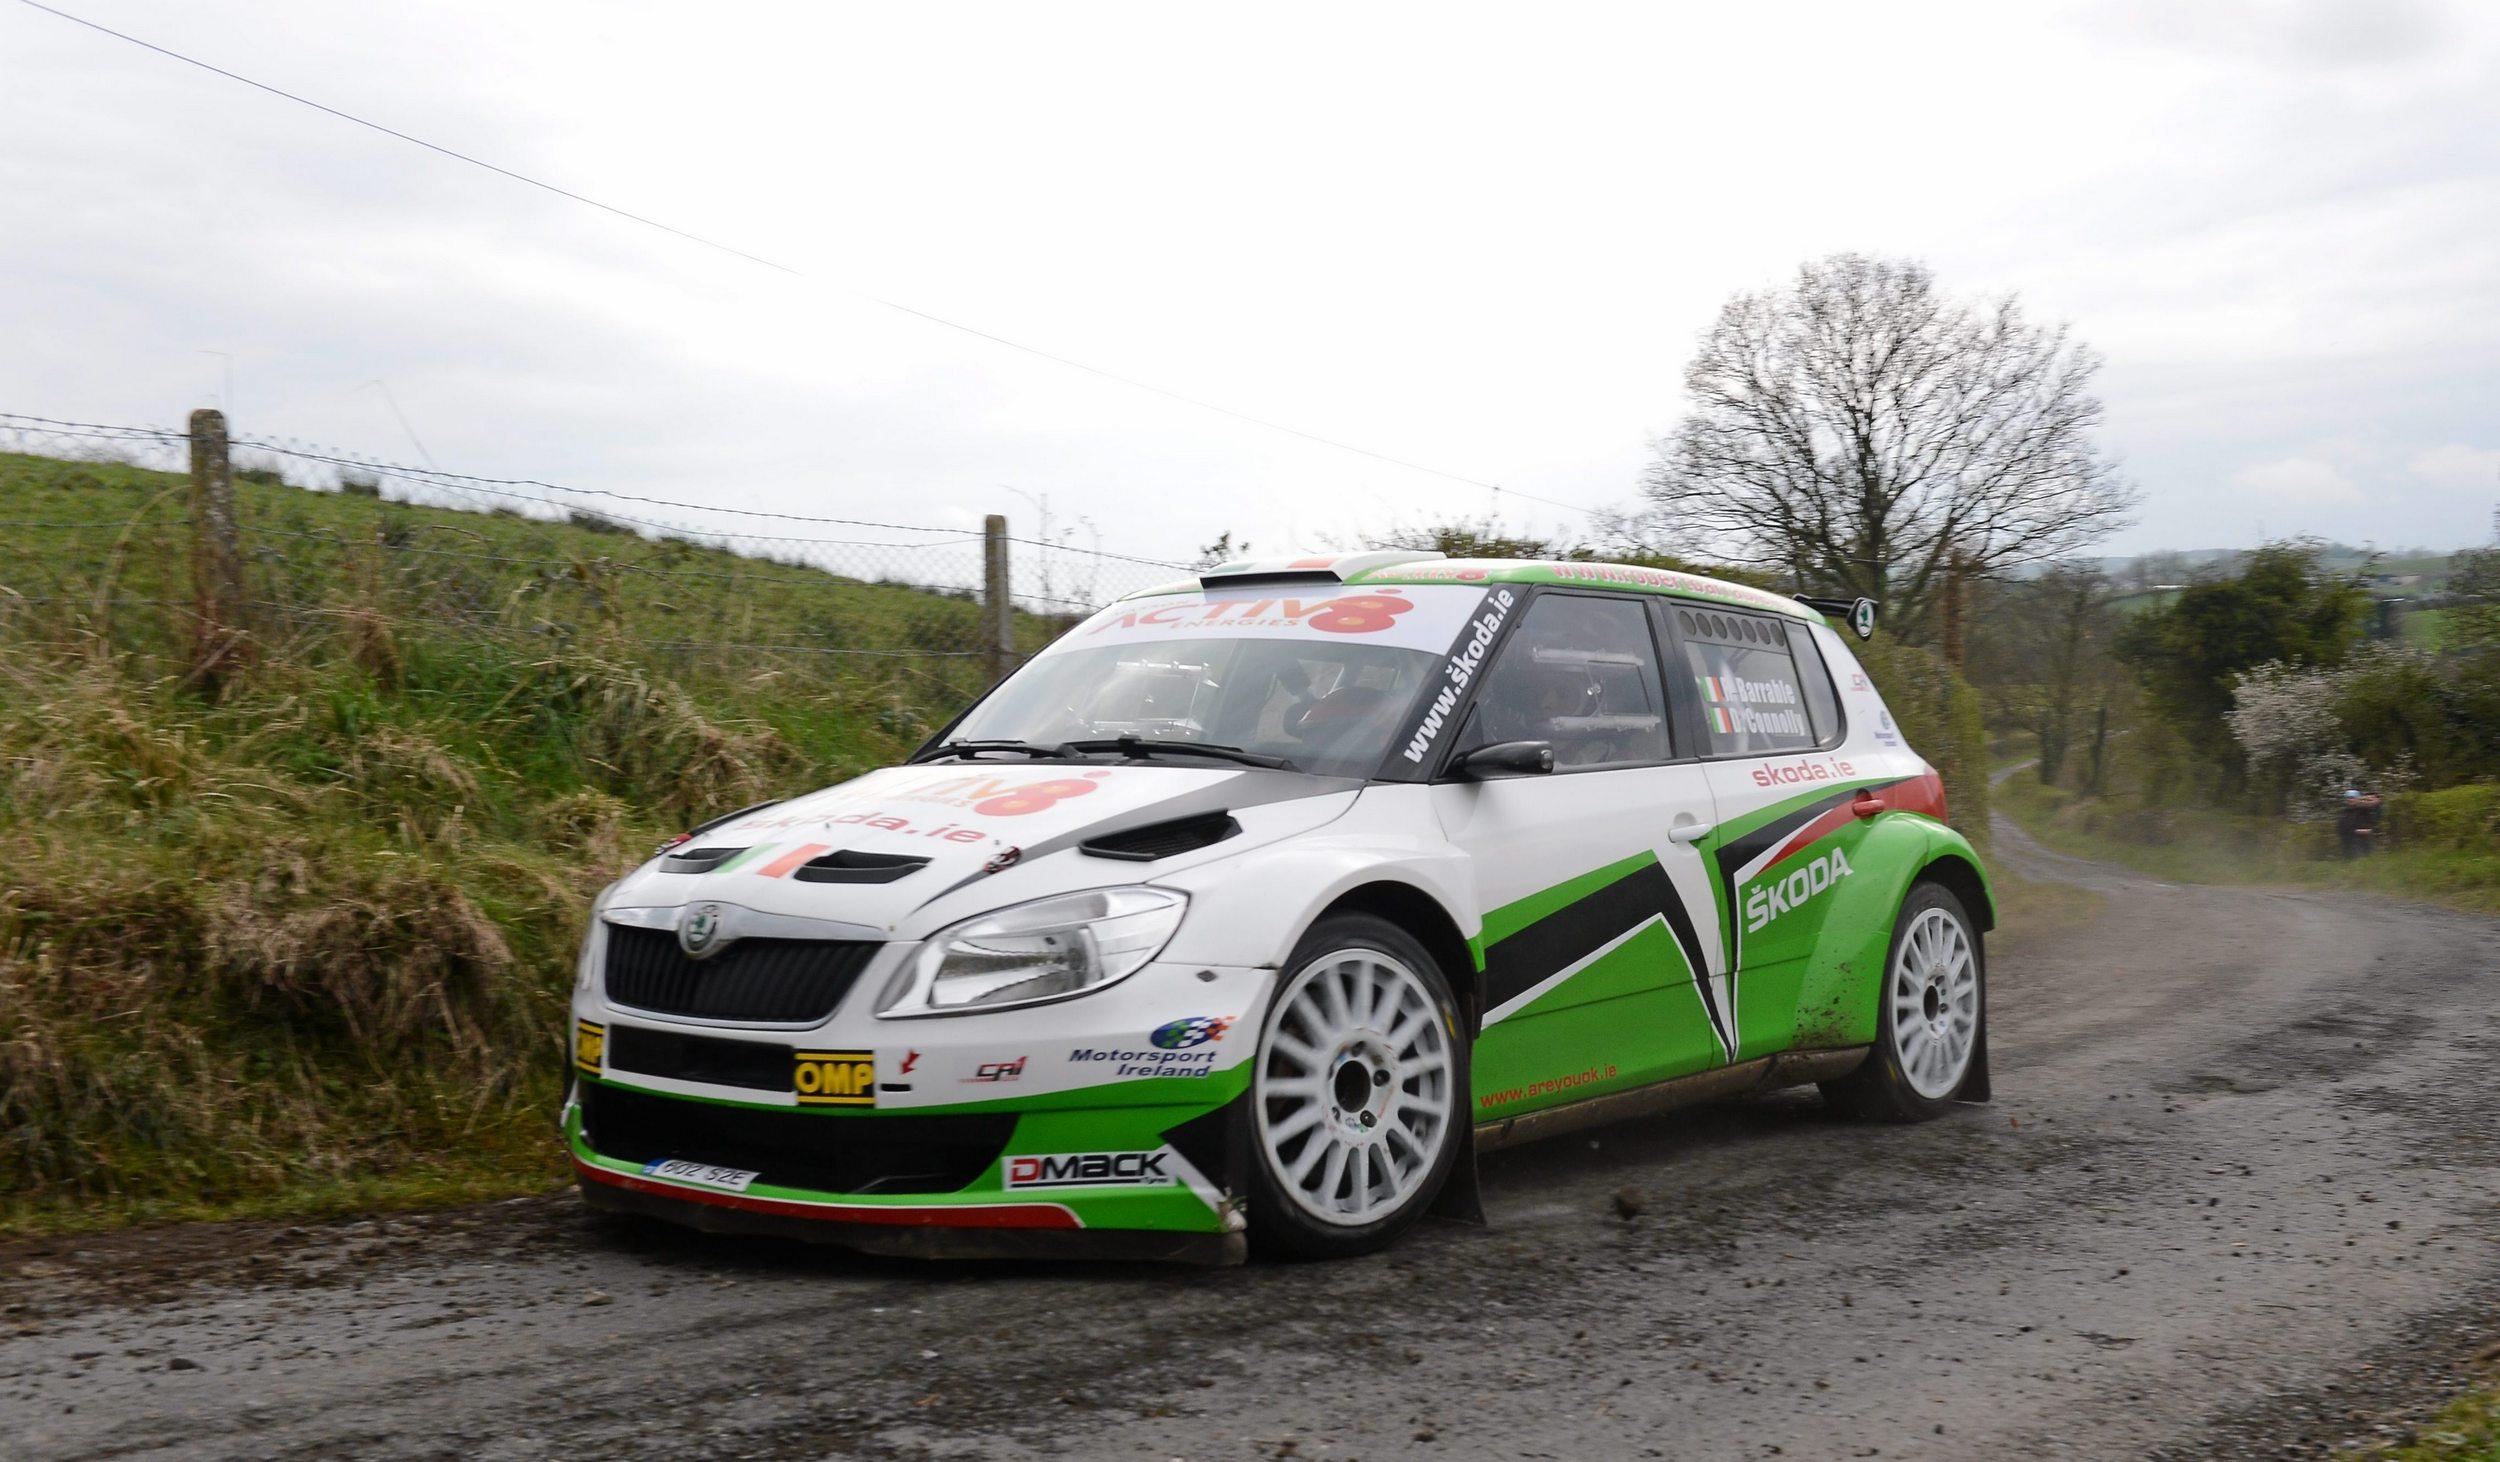 Skoda Ireland Backs Young Rally Driver | Rev.ie